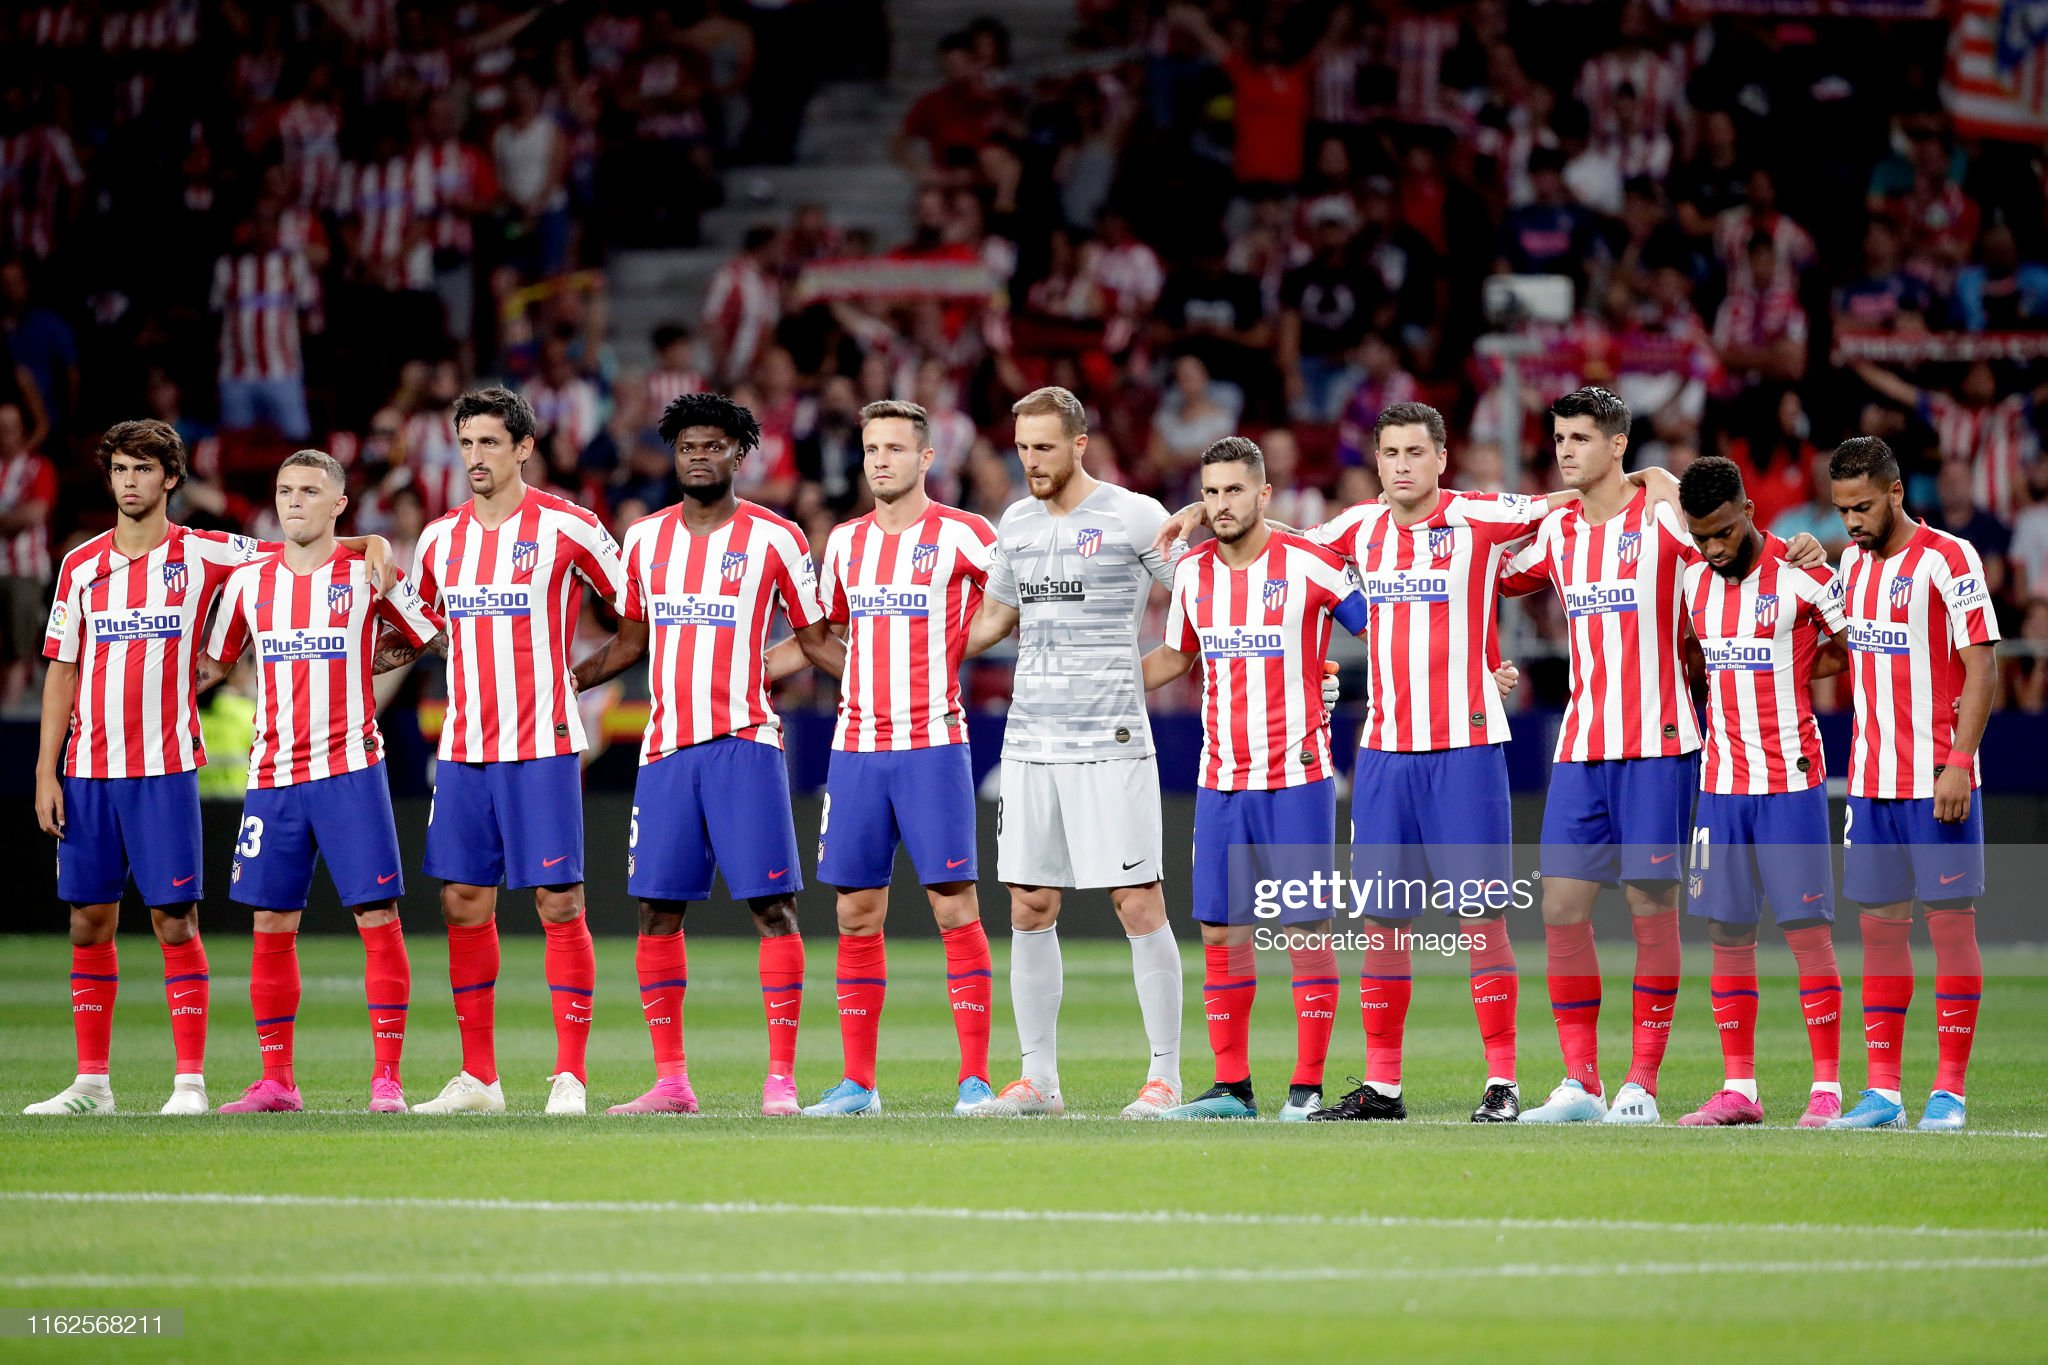 Hilo del Atlético de Madrid Jan-oblak-of-atletico-madrid-gimenez-of-atletico-madrid-thomas-of-picture-id1162568211?s=2048x2048